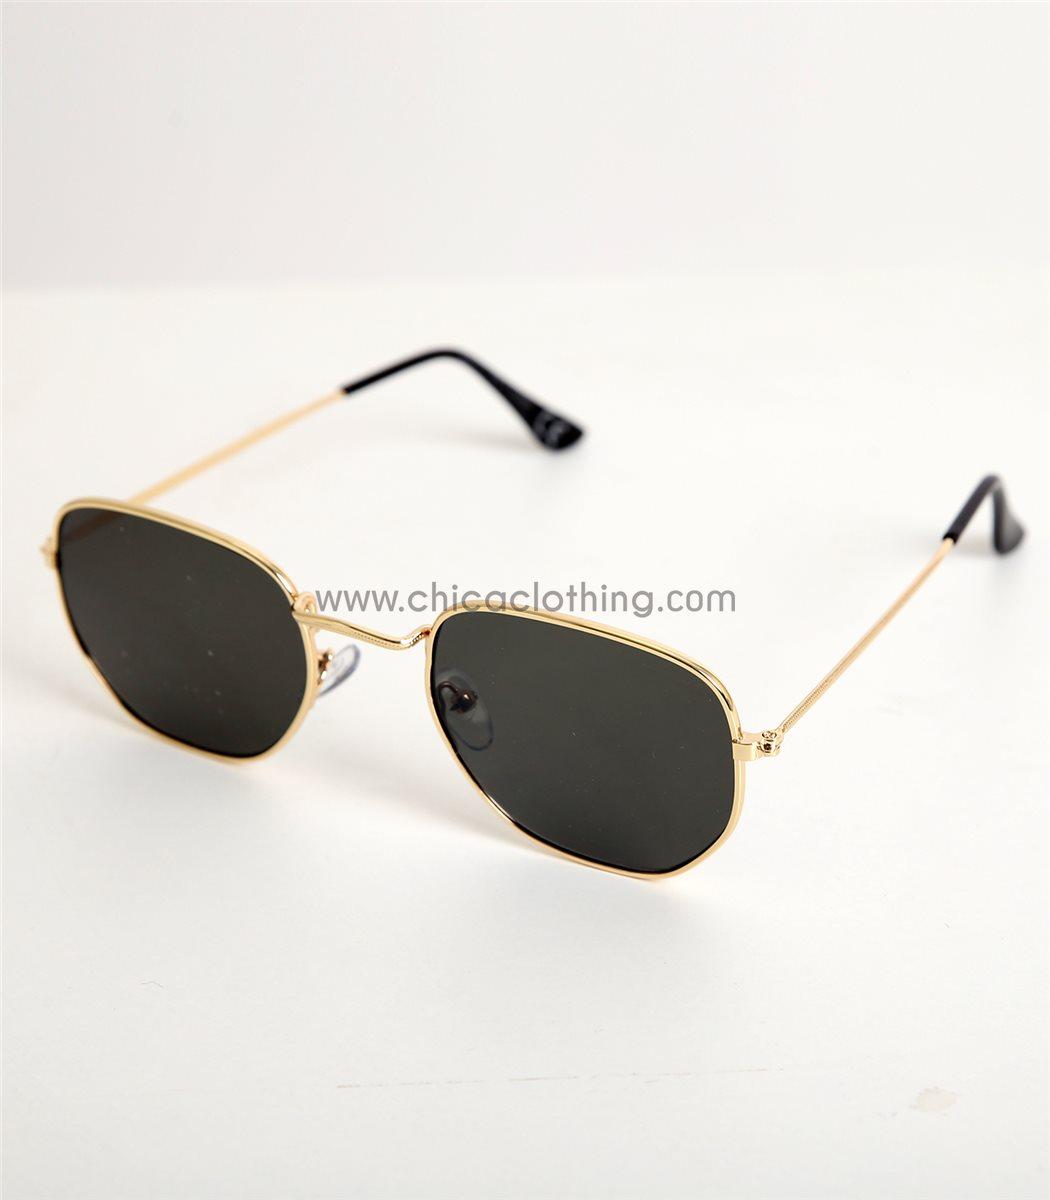 ac138631d0 Γυναικεία πράσινα γυαλιά ηλίου με χρυσό σκελετό